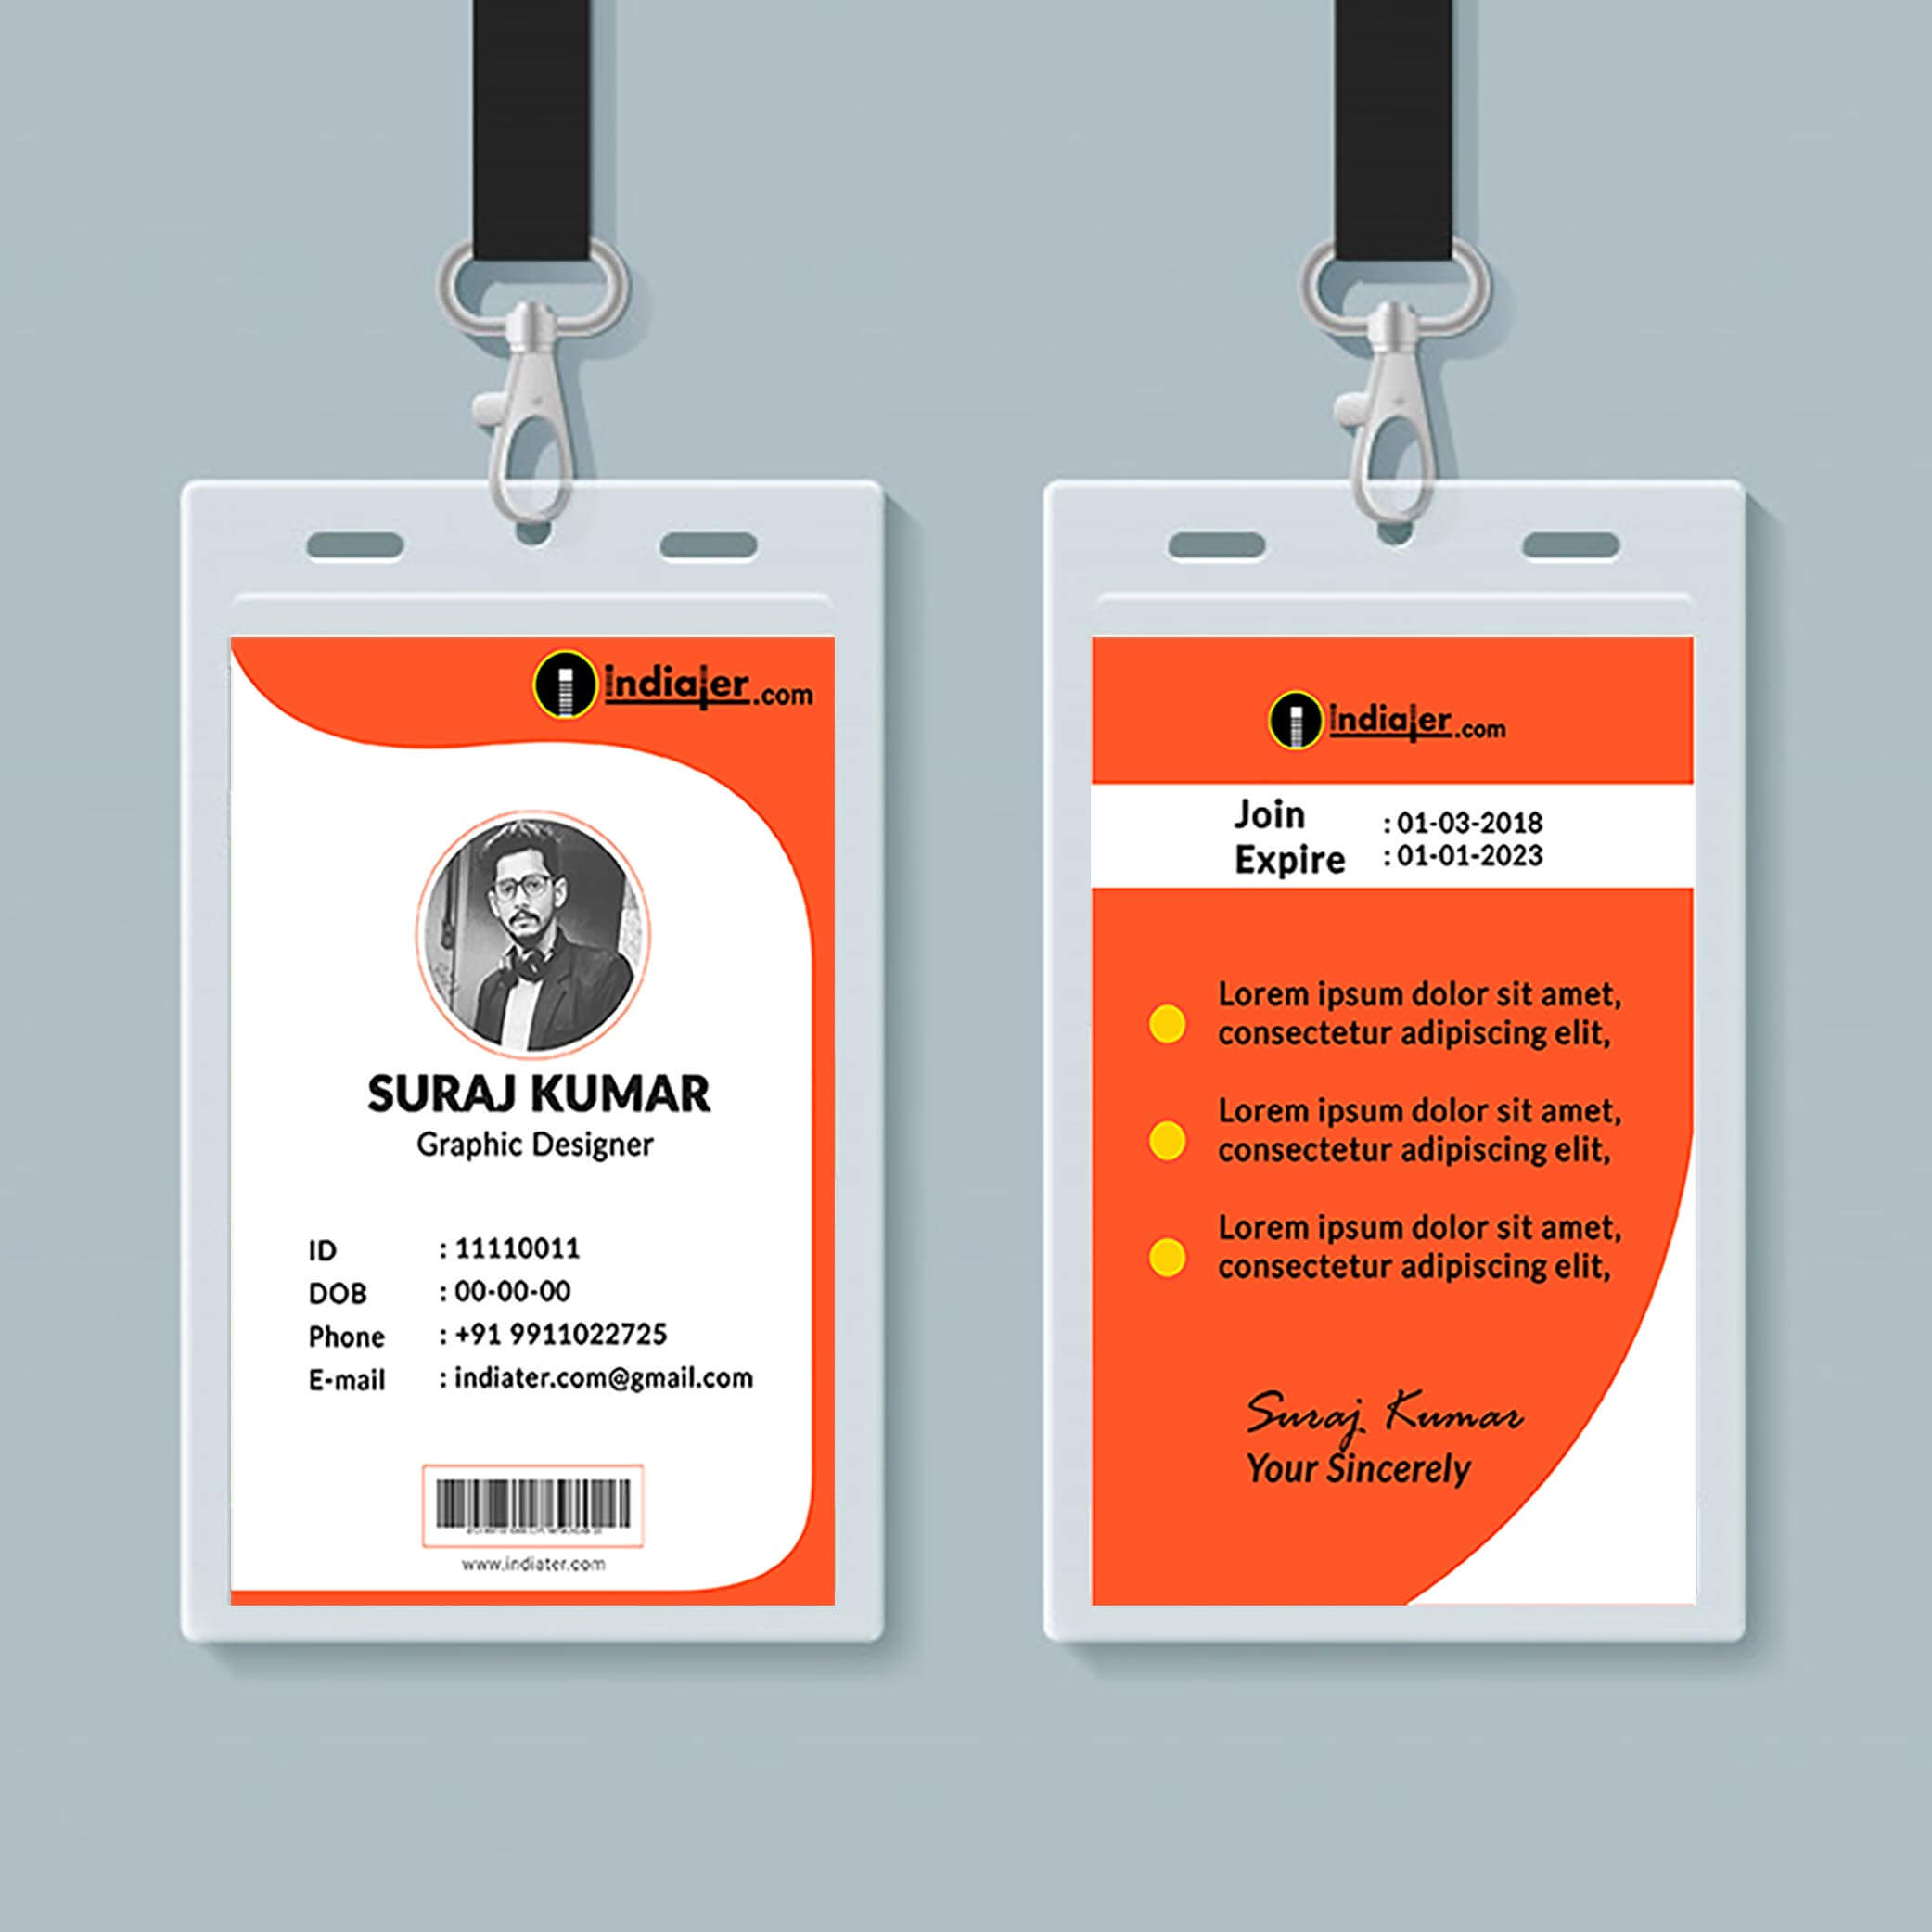 Multipurpose Corporate Office Id Card Free Psd Template inside Template For Id Card Free Download